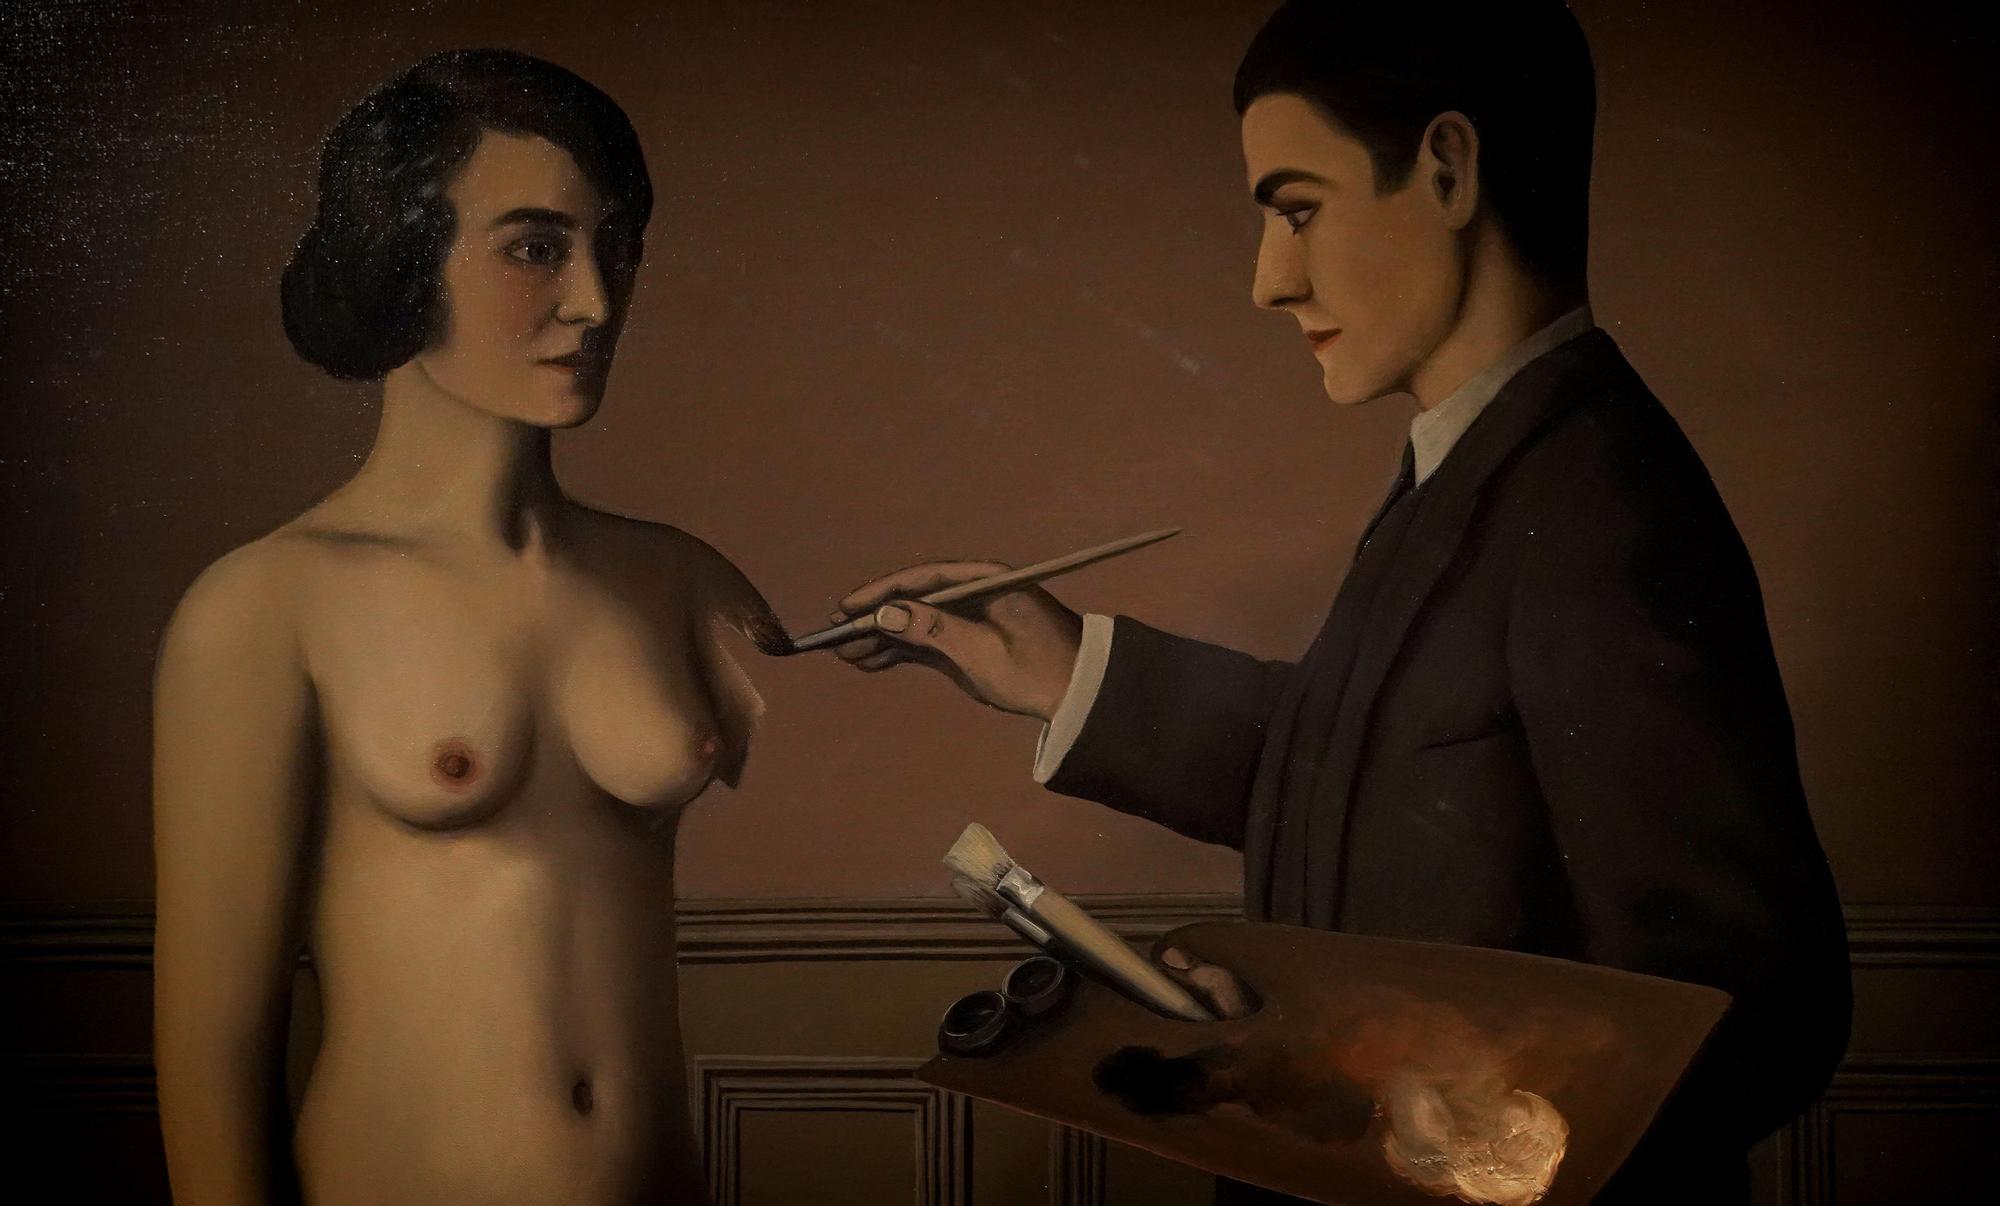 Exposición de Magritte en el Museo Thyssen